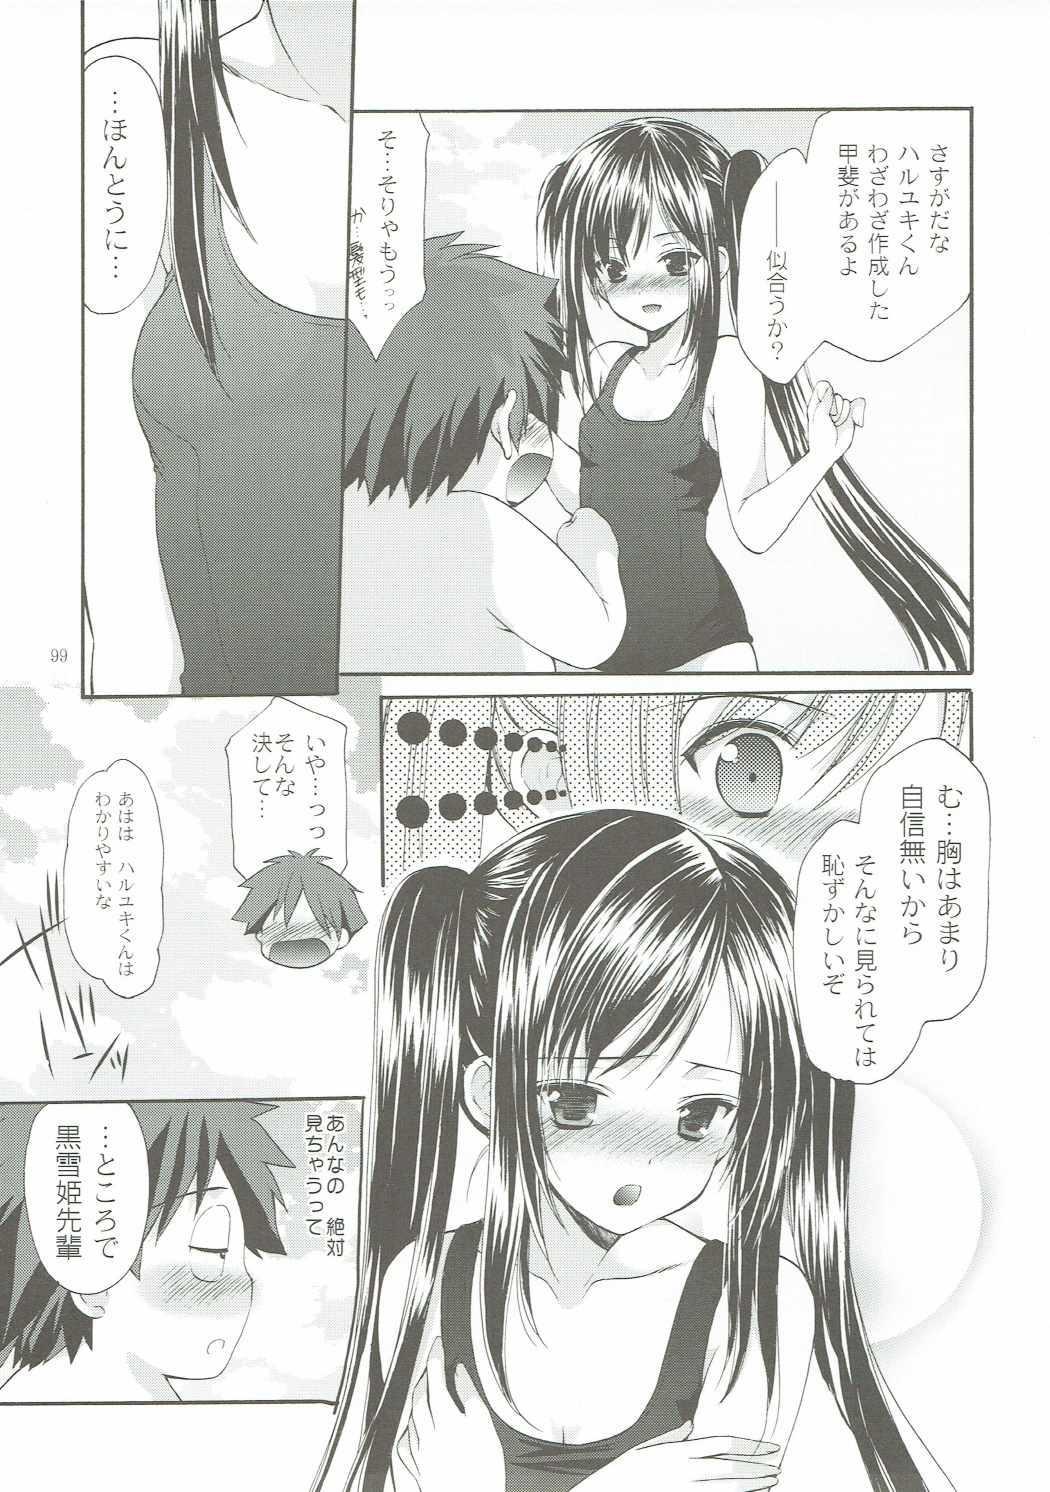 ANIME COLLECTION Imomuya Honpo - Singleton Anime Soushuuhen 97